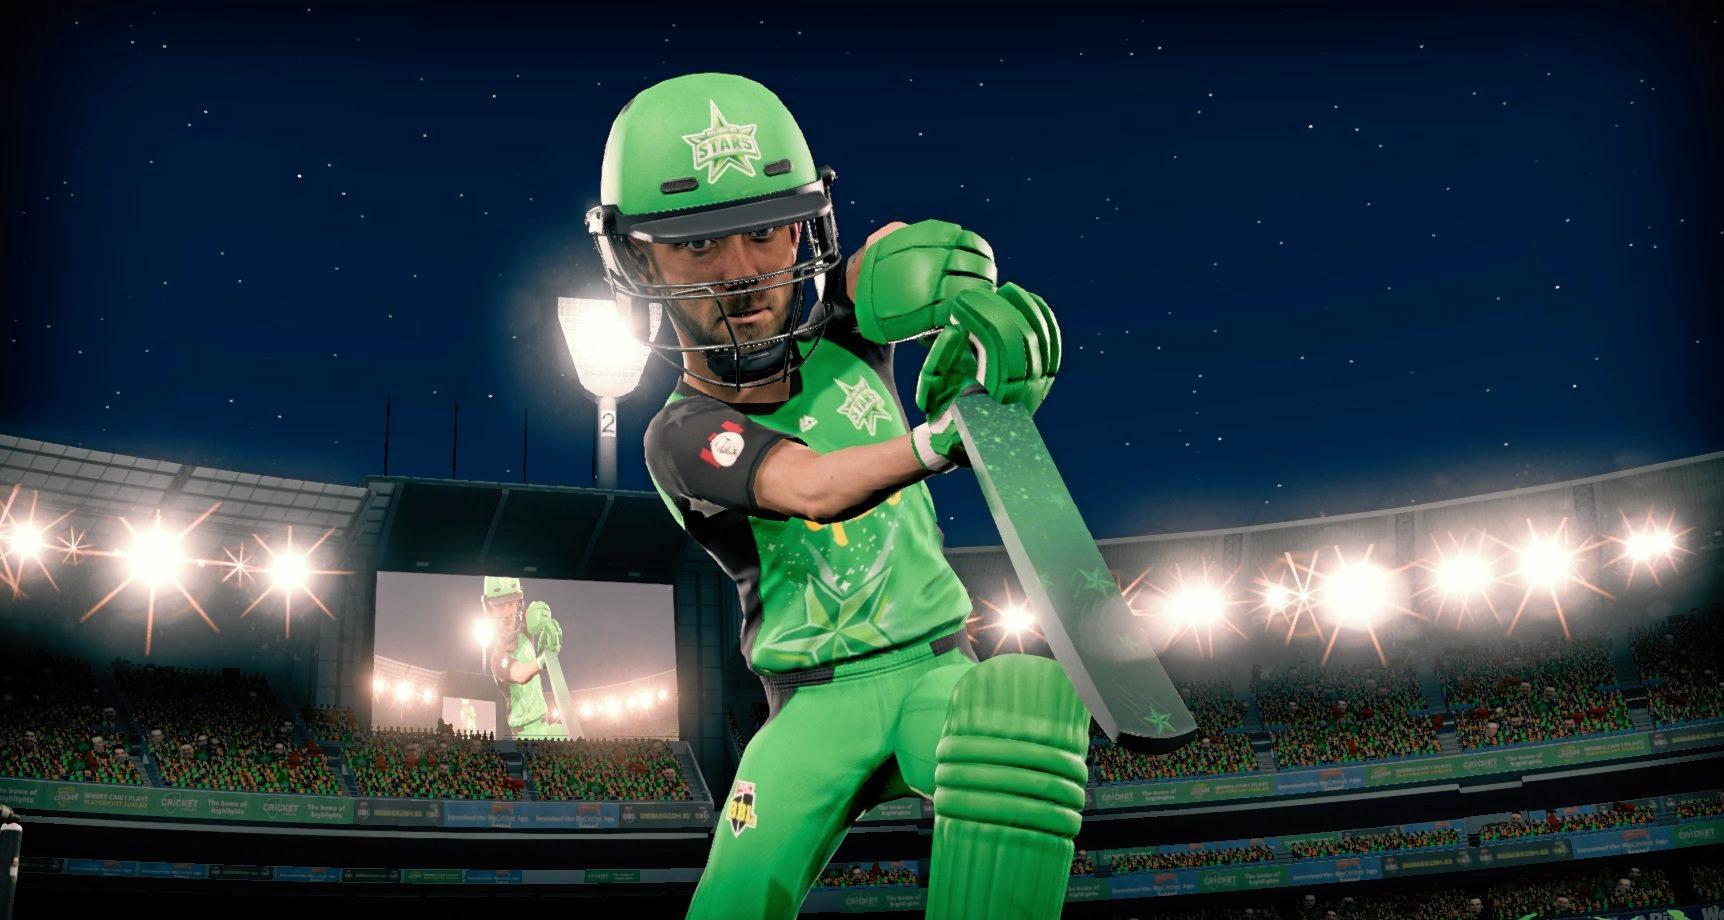 Aussie company creates Twenty20 cricket game for consoles